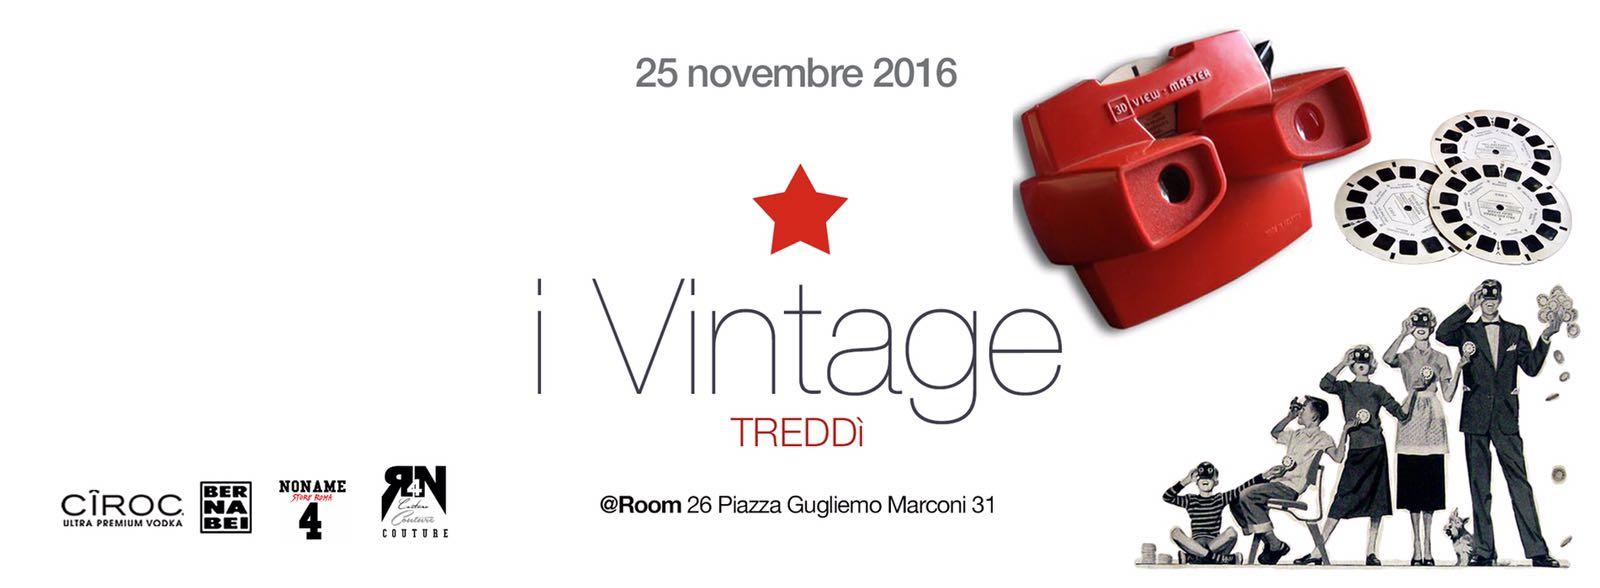 Serata Revival Roma si balla al Room 26 venerdì 25 novembre 2016